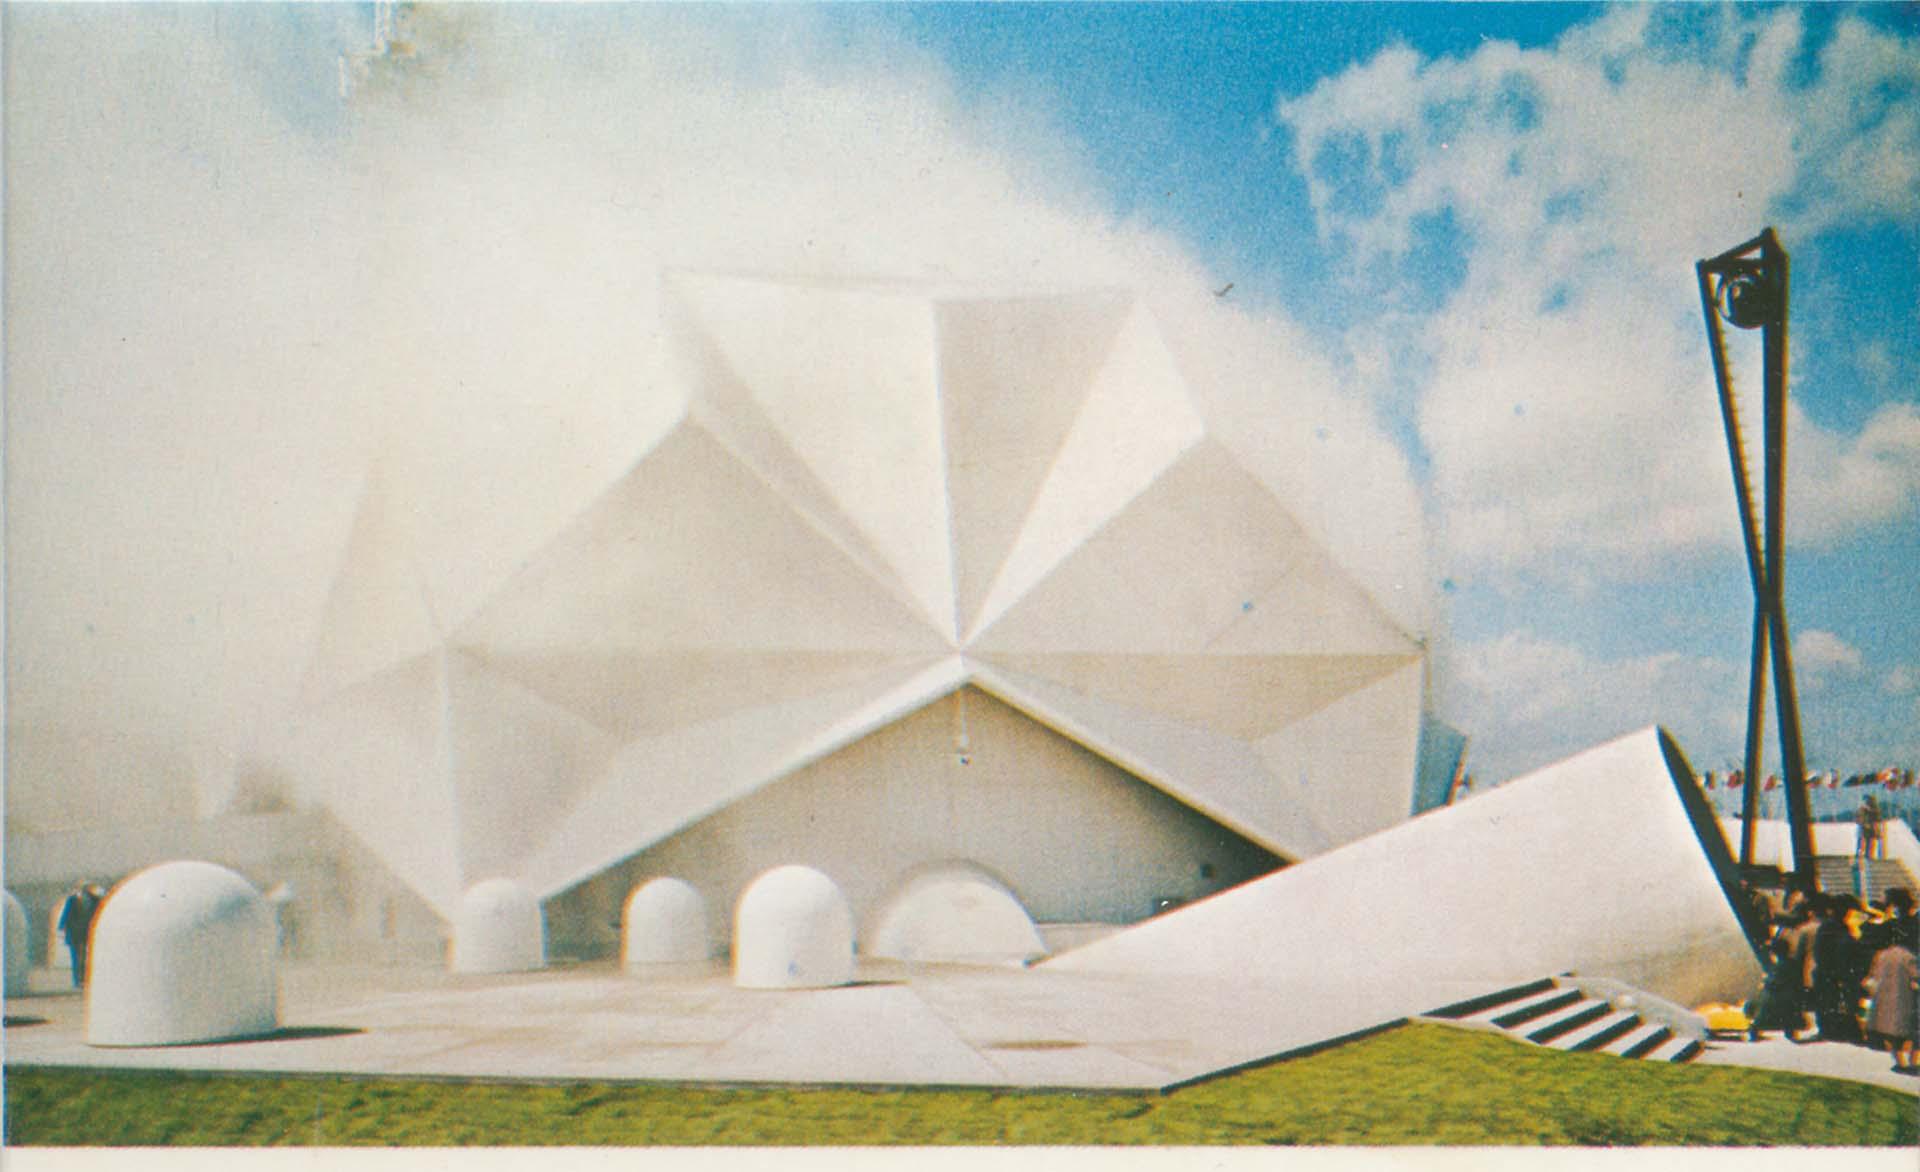 Pepsi Pavillion, A.E.T. Osaka EXPO 1970, Osaka.